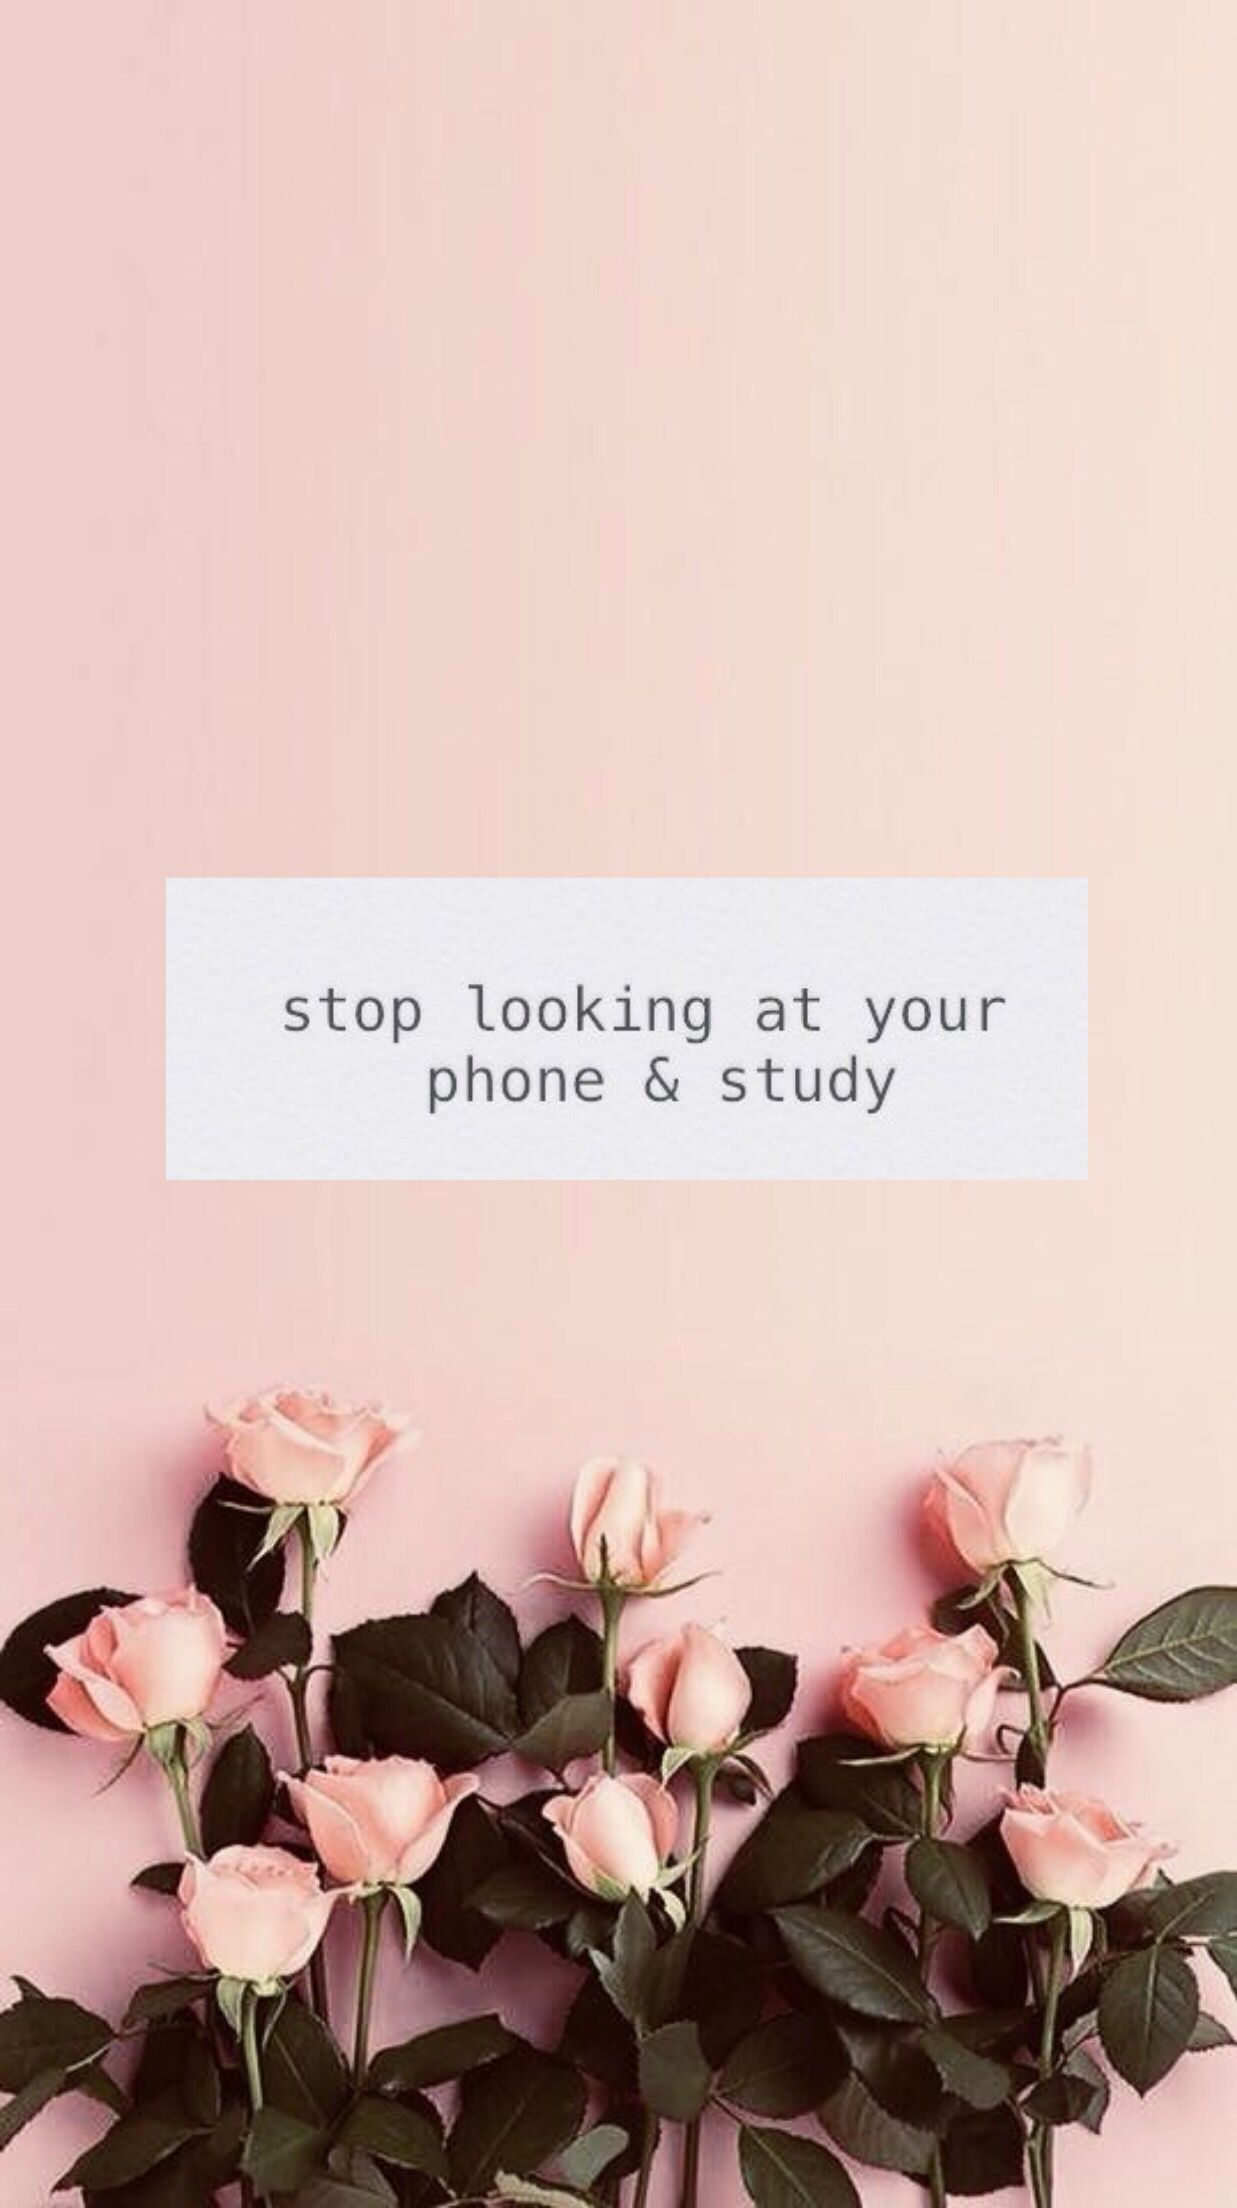 Study Motivation Wallpaper Study Inspiration Quotes Study Motivation Quotes Motivational Quotes Wallpaper